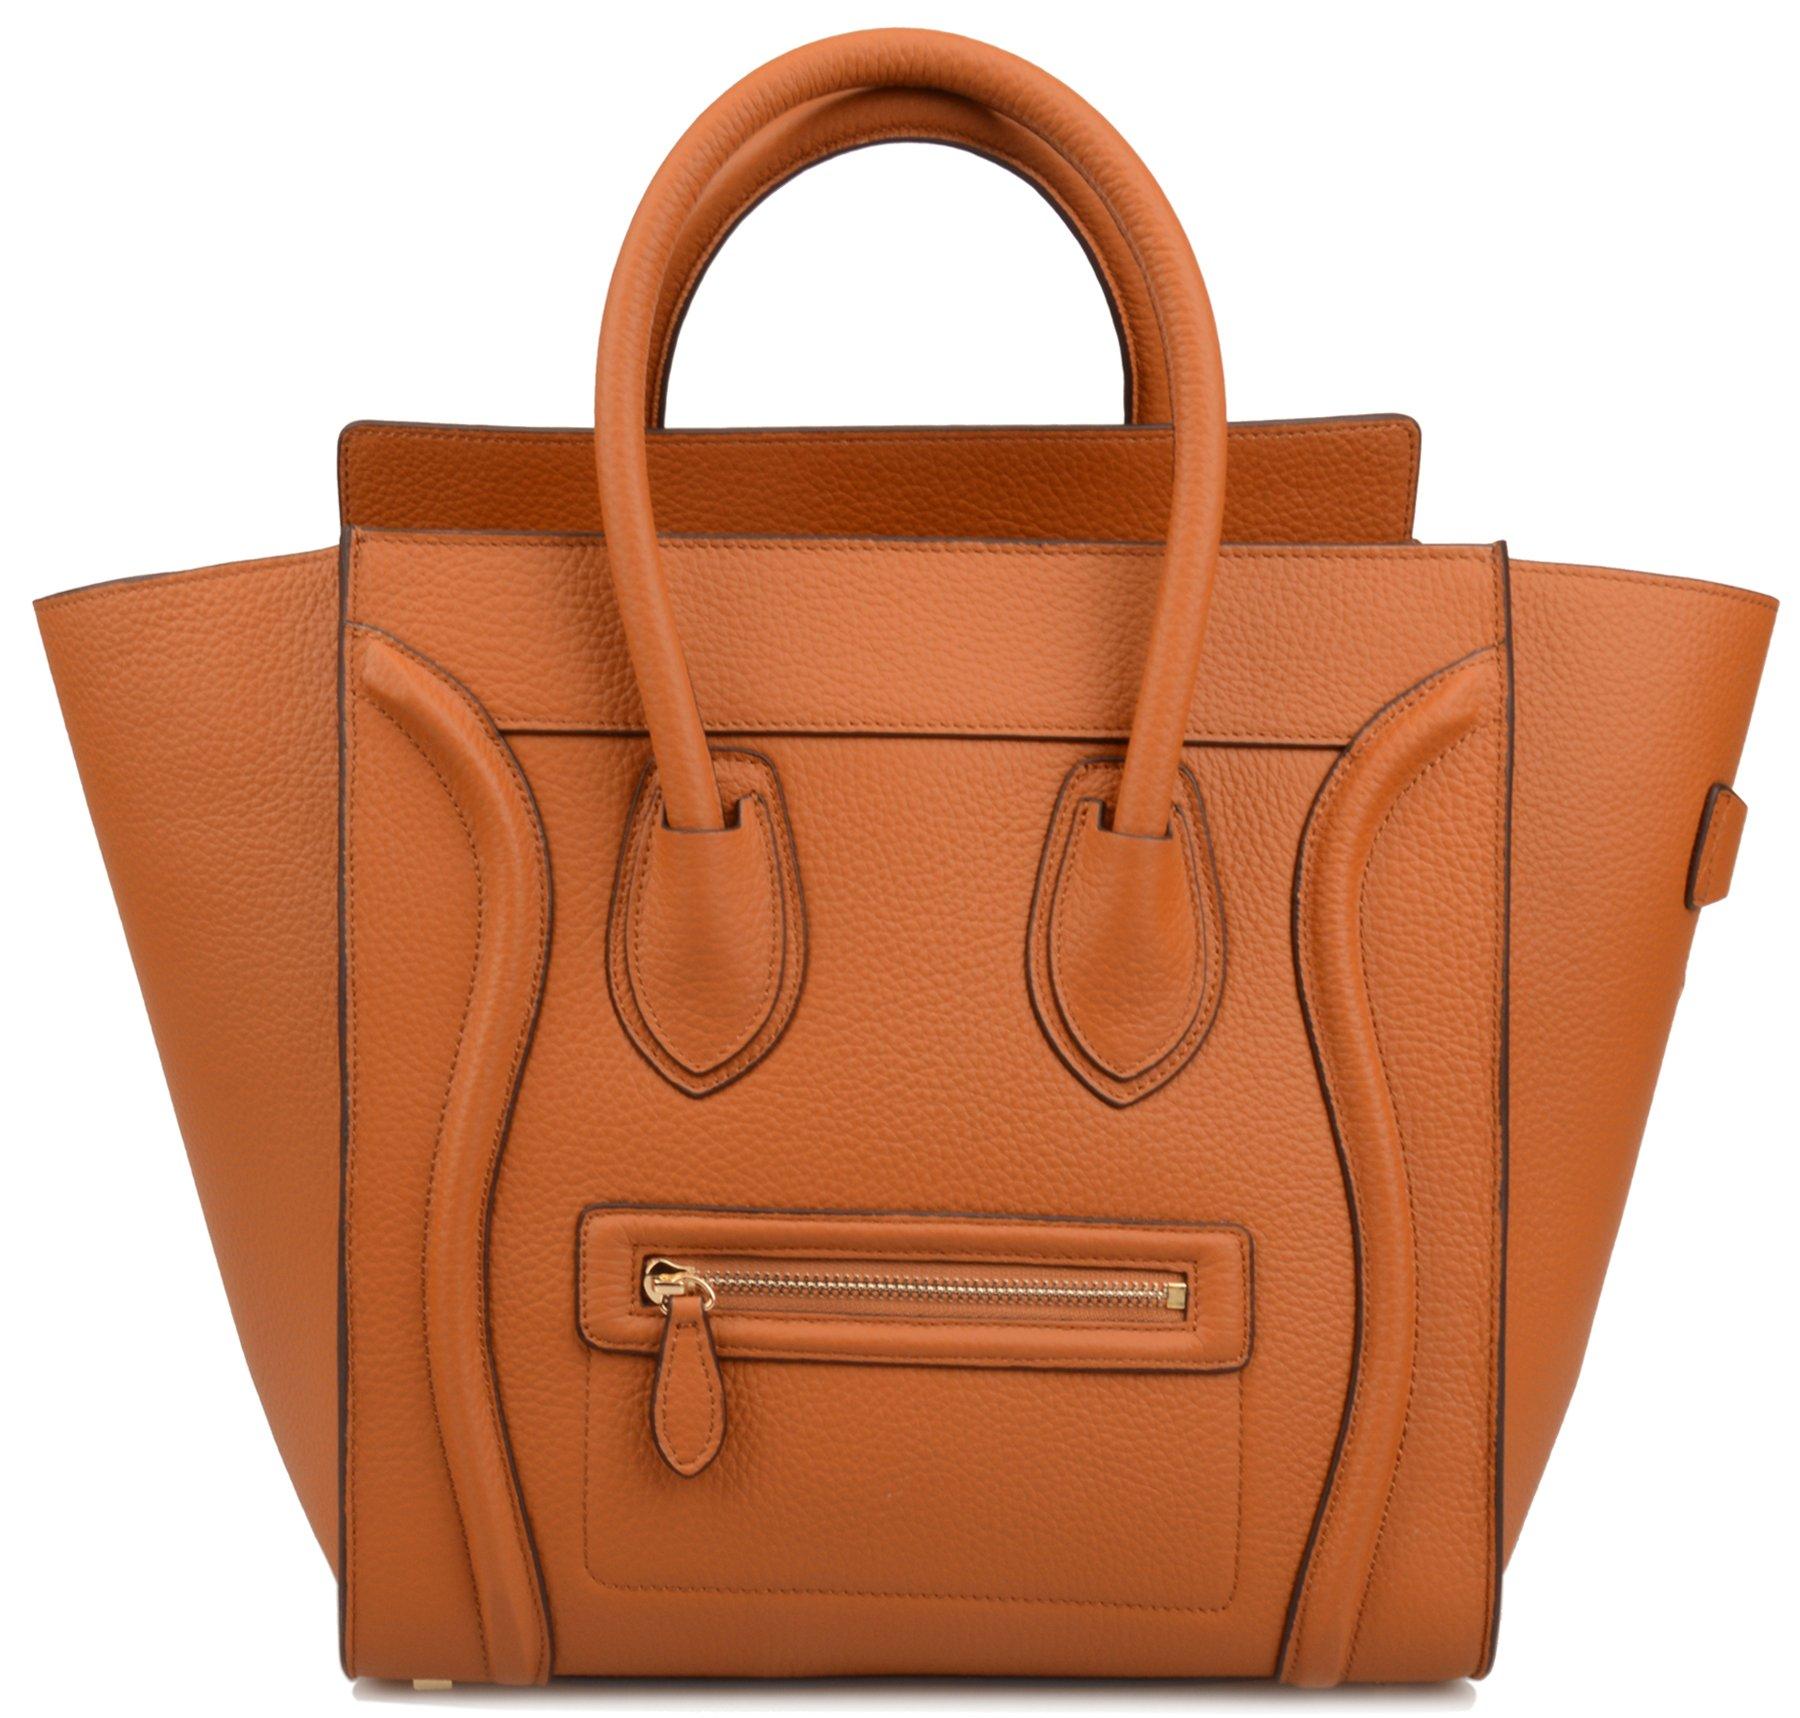 Ainifeel Women s Genuine Leather Smile Large Top Handle Handbag Purse  (Large ae62ddd988a0a